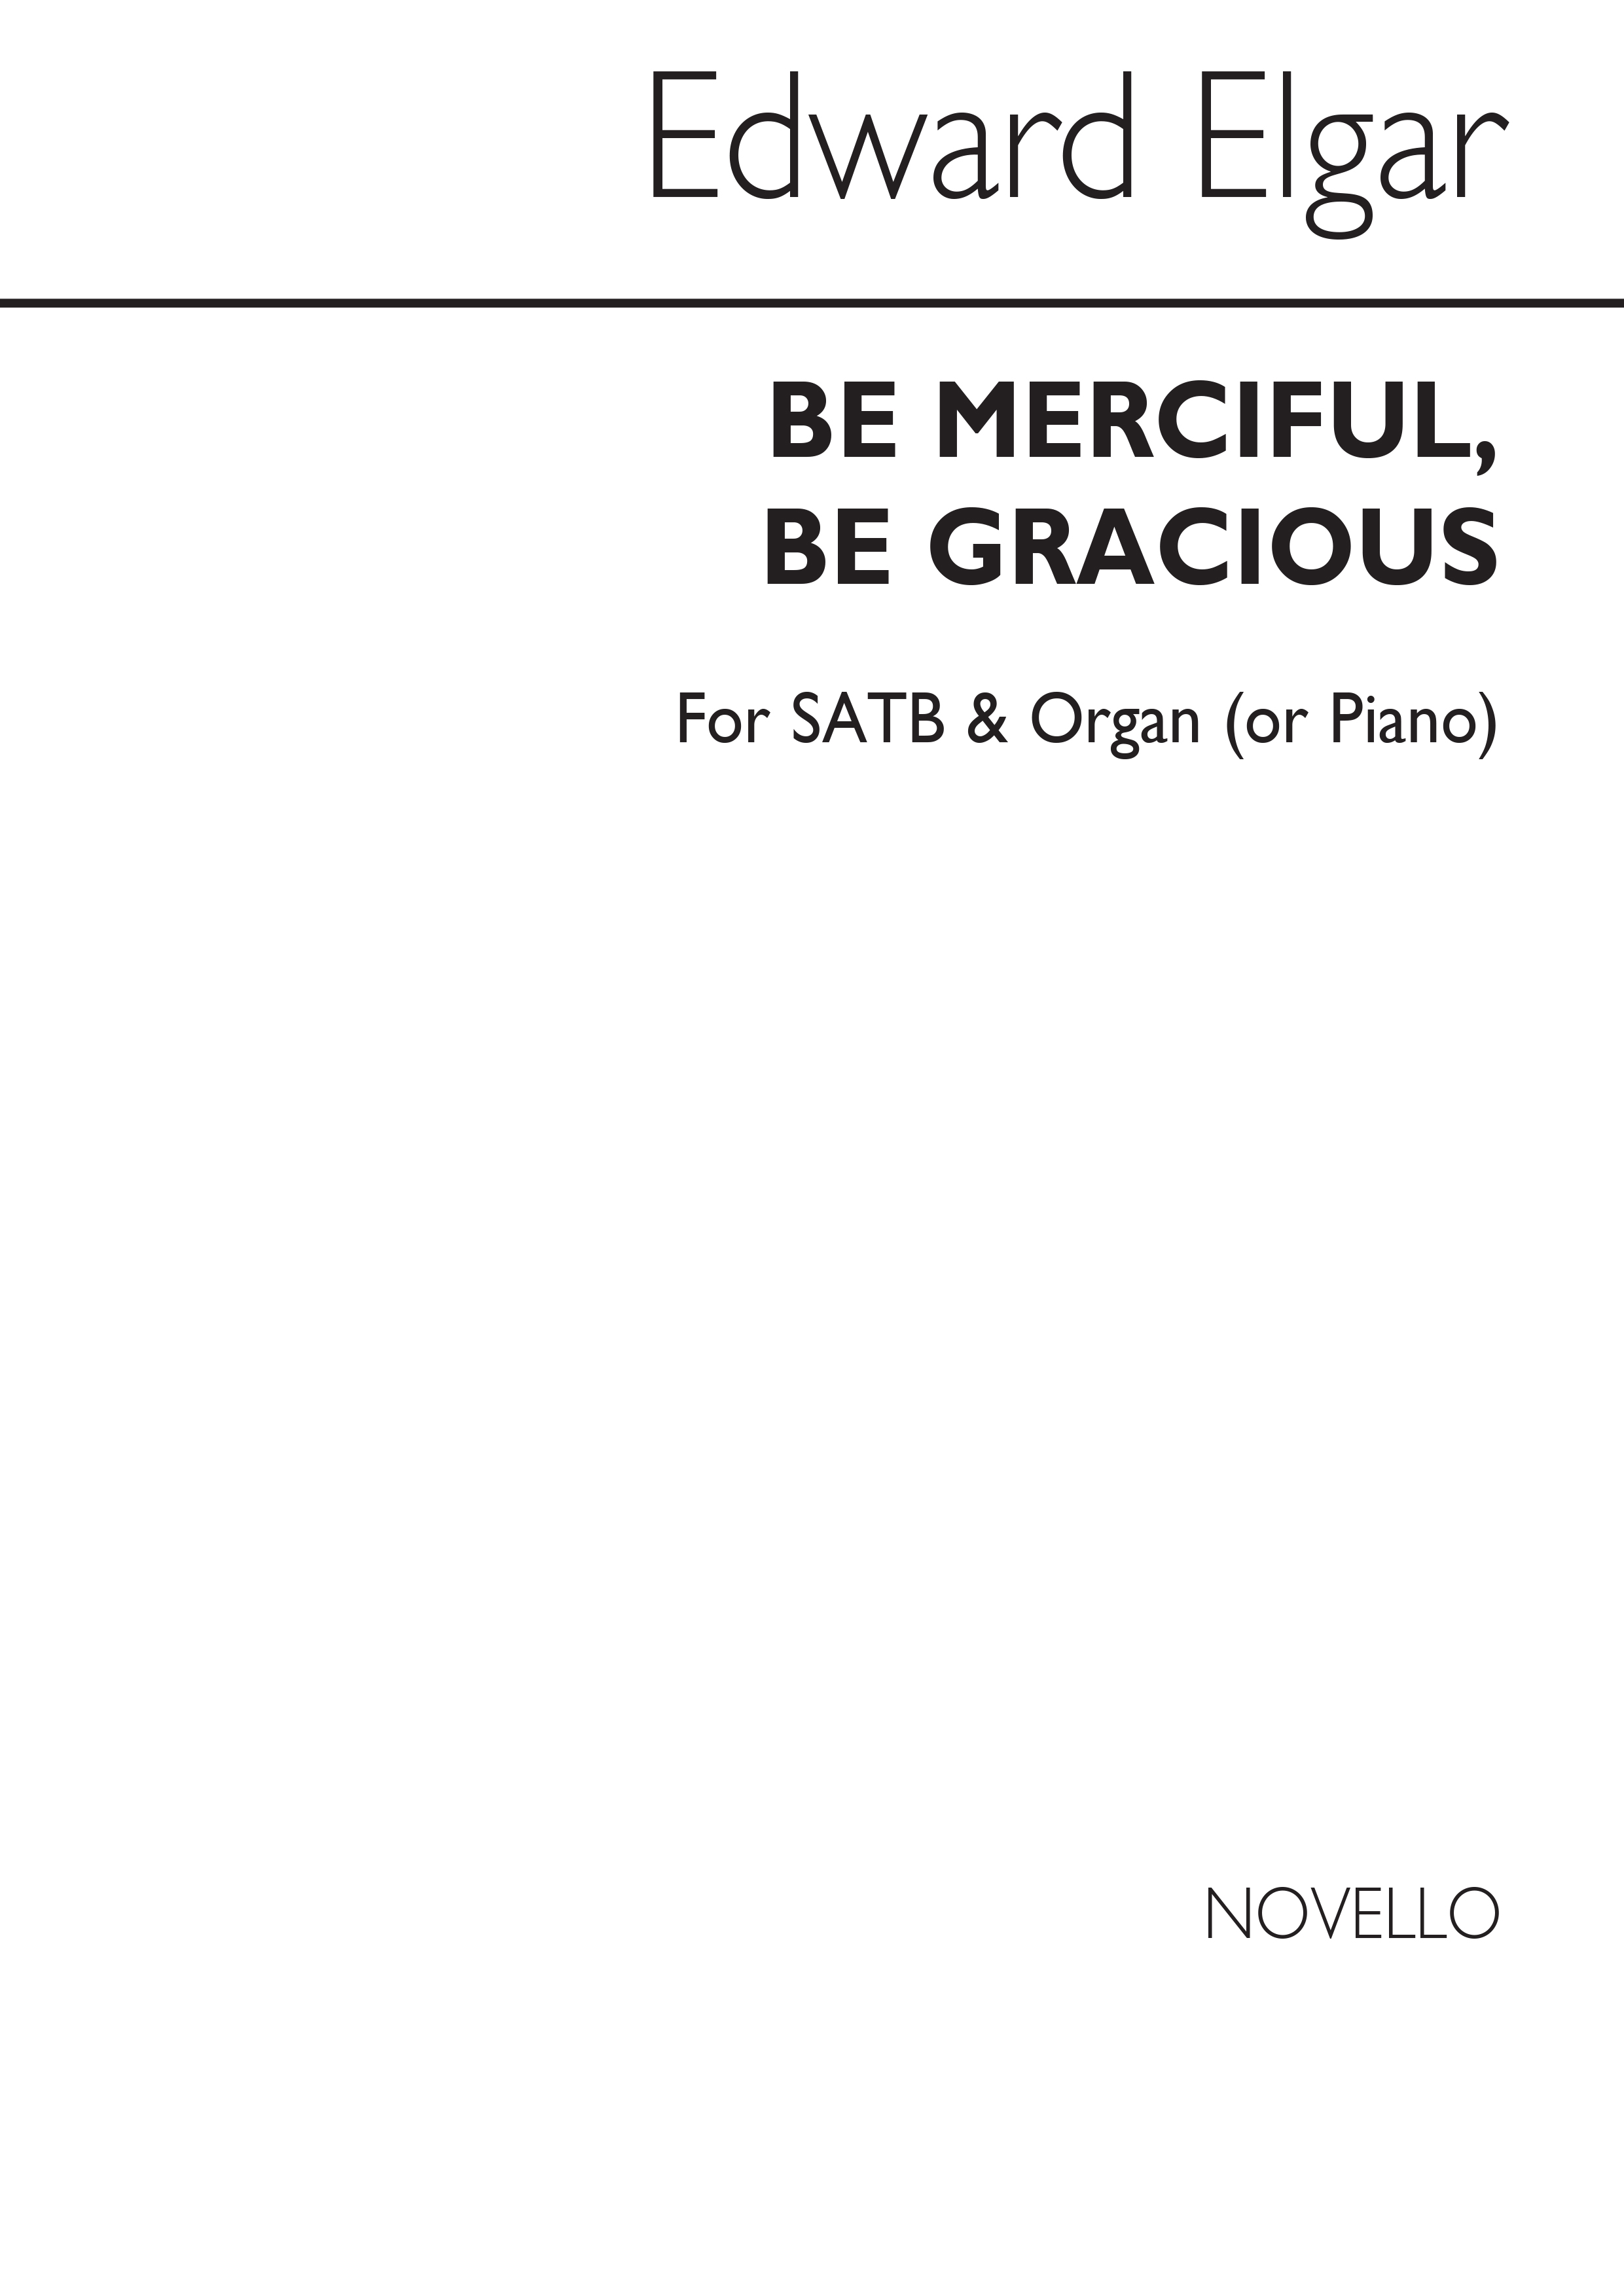 Edward Elgar: Be Merciful Be Gracious: SATB: Vocal Score